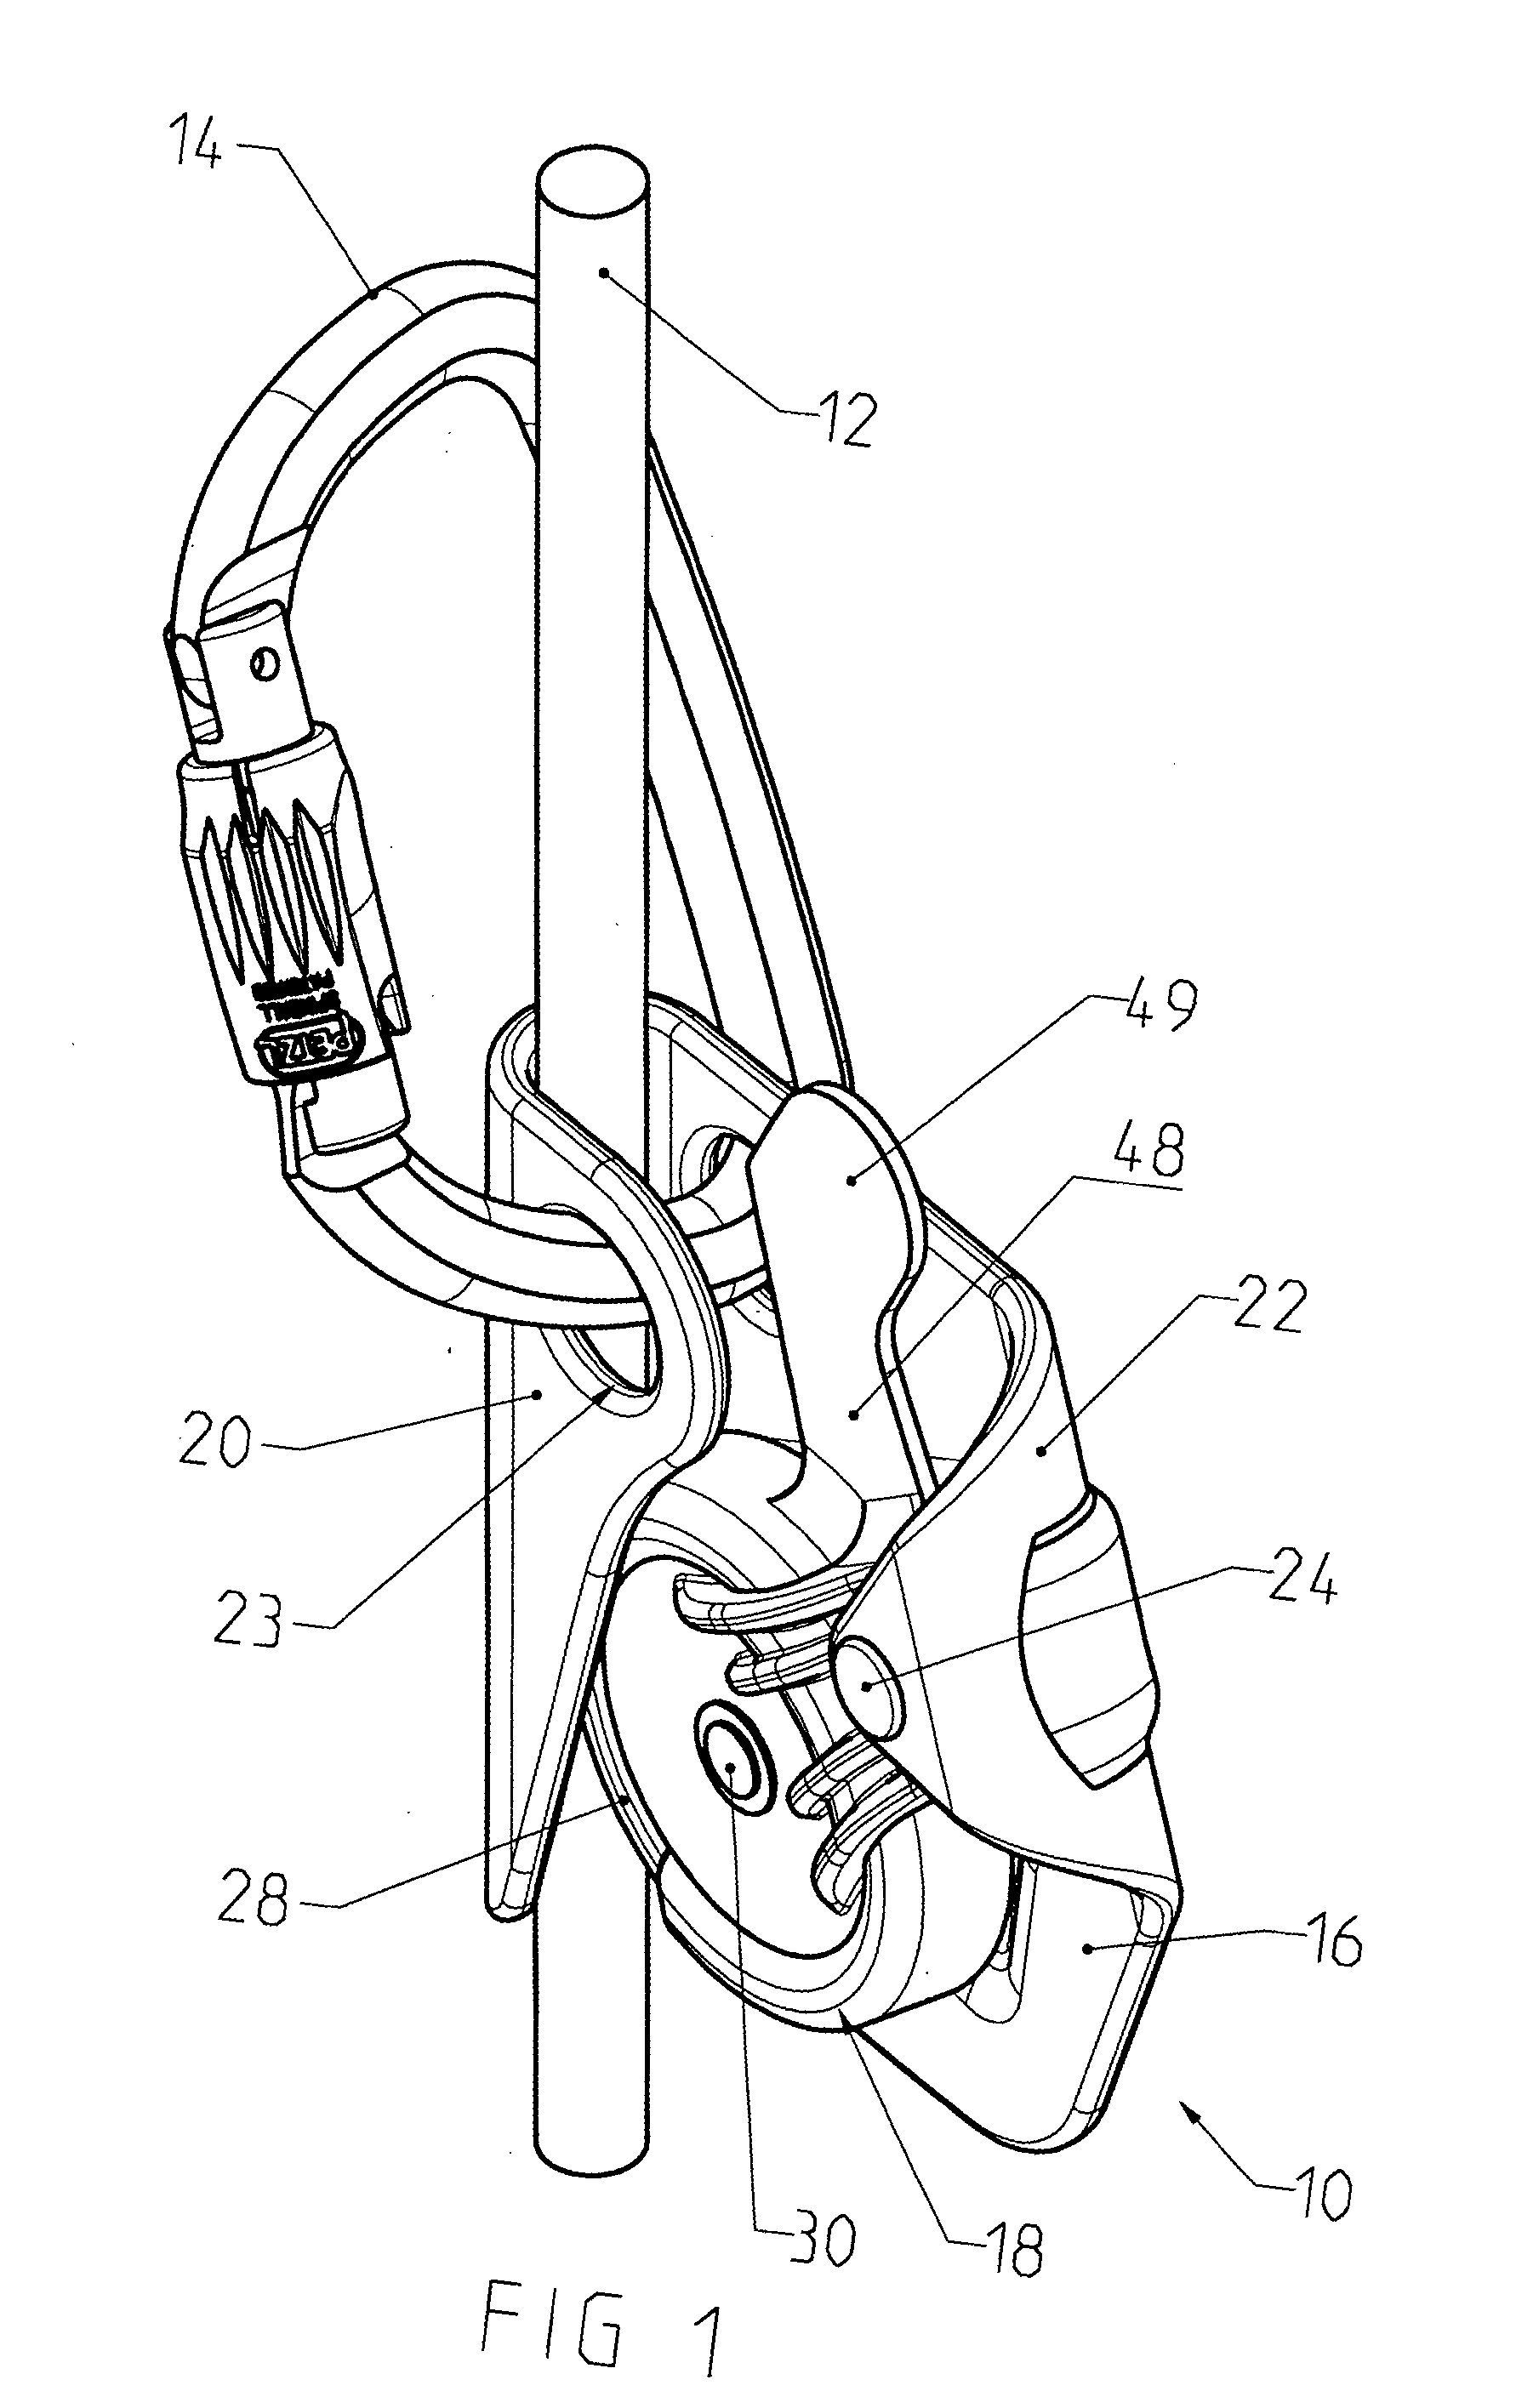 menards safety harness  menards  get free image about wiring diagram